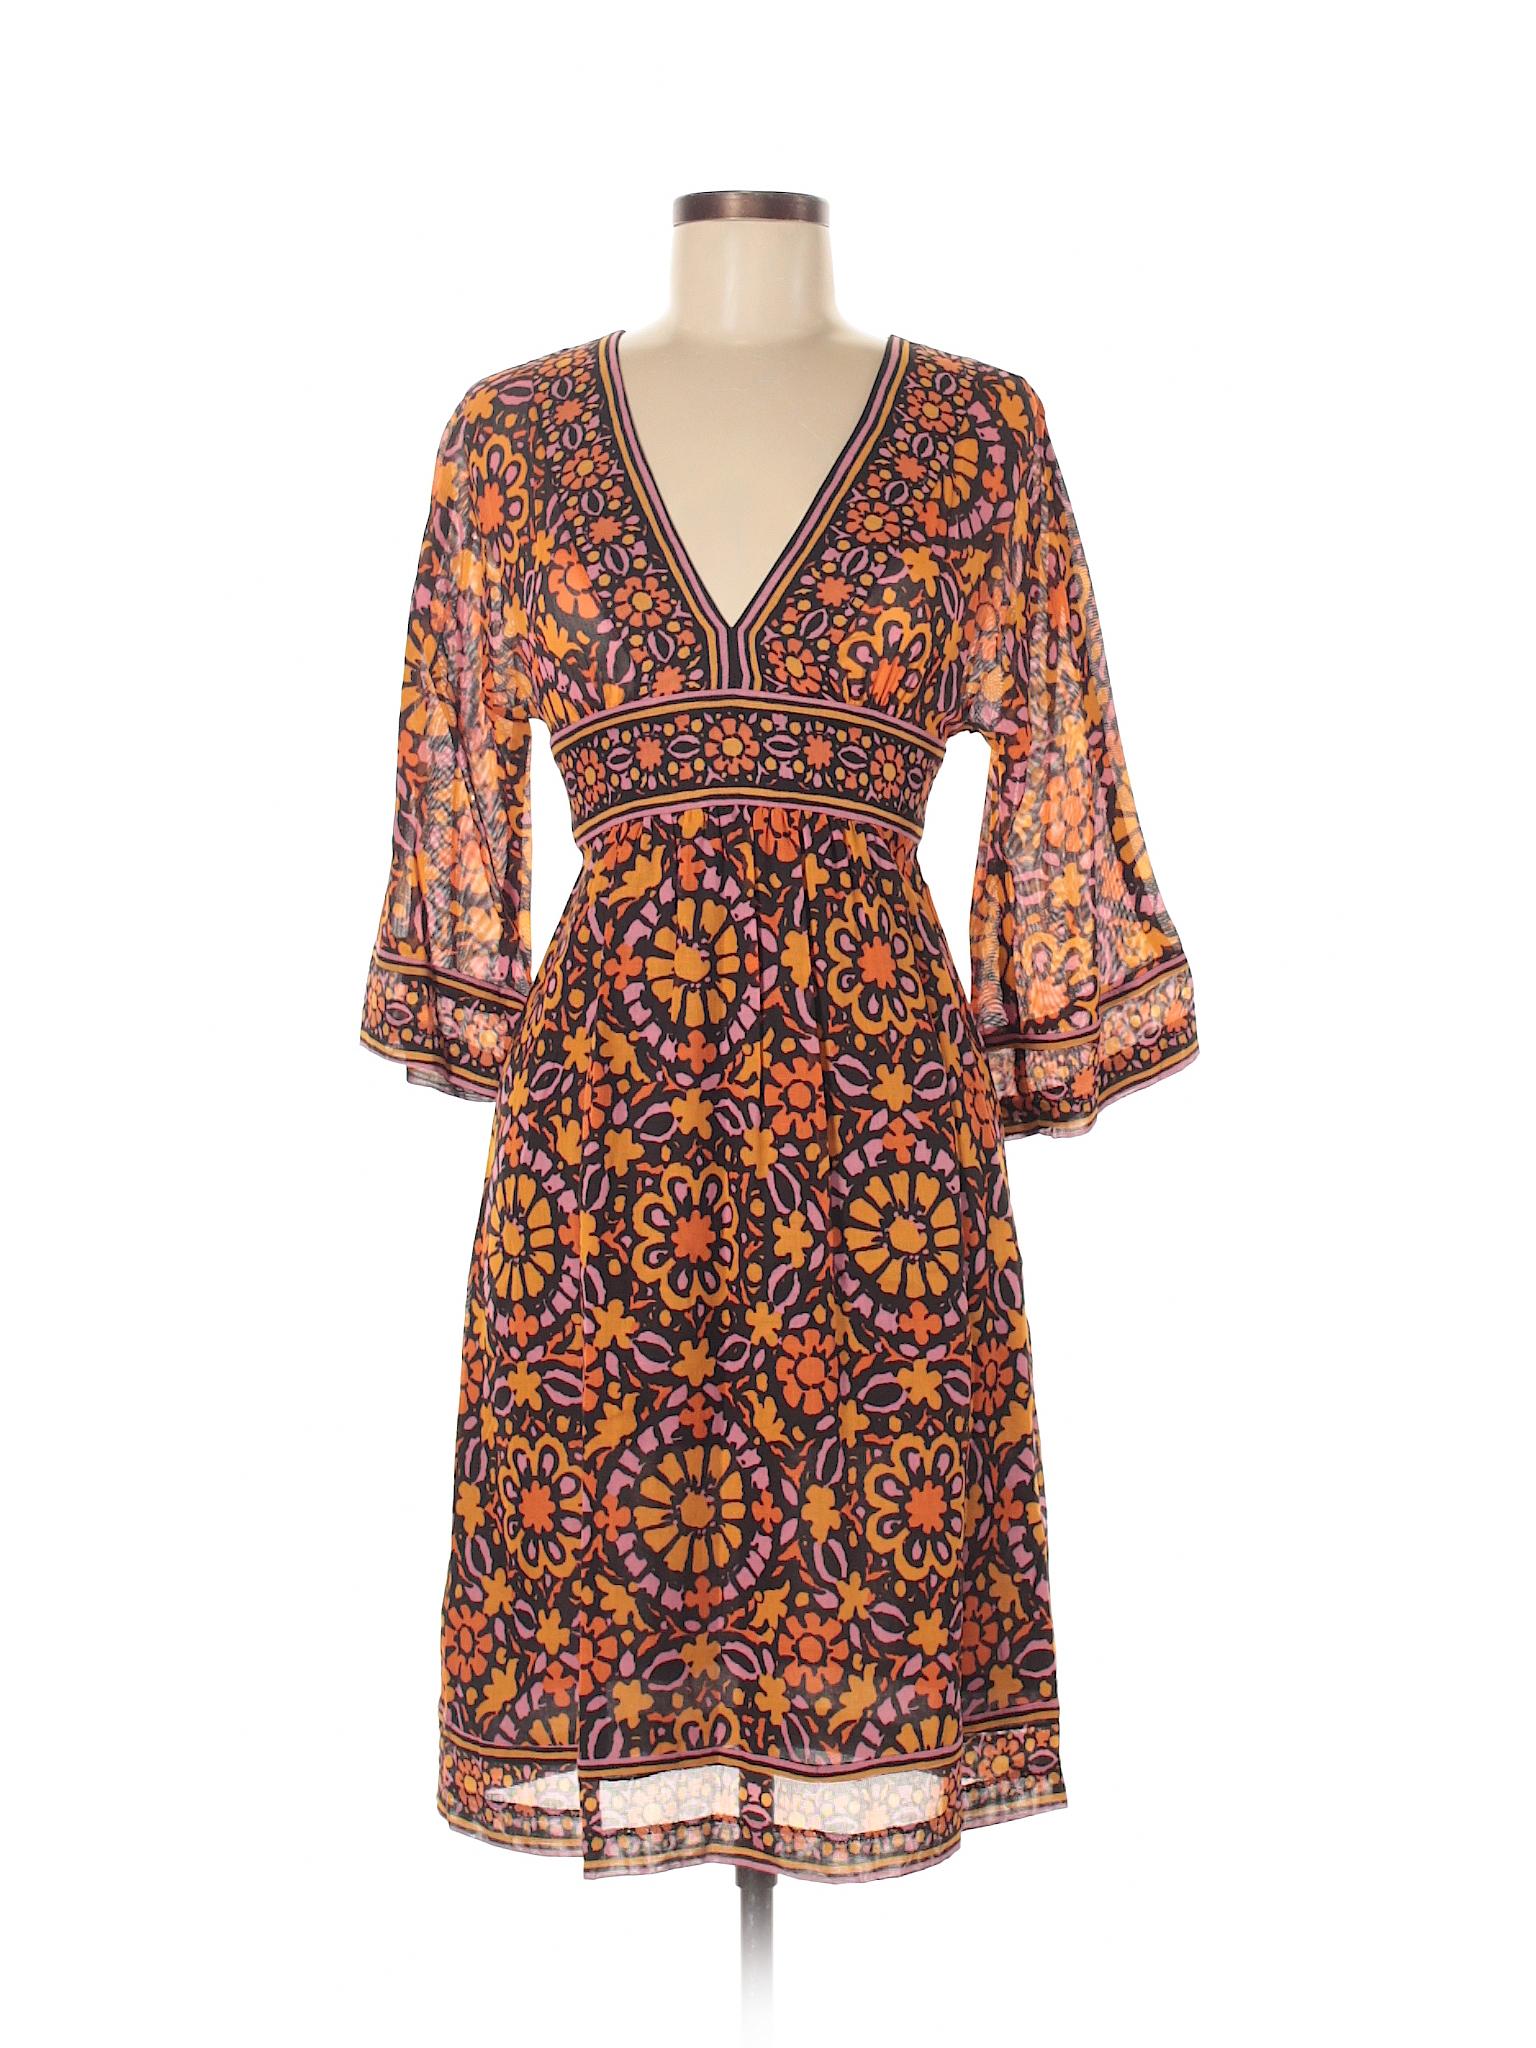 Turk Selling Turk Dress Trina Casual Selling Trina Trina Turk Dress Selling Casual A6wqOn4F